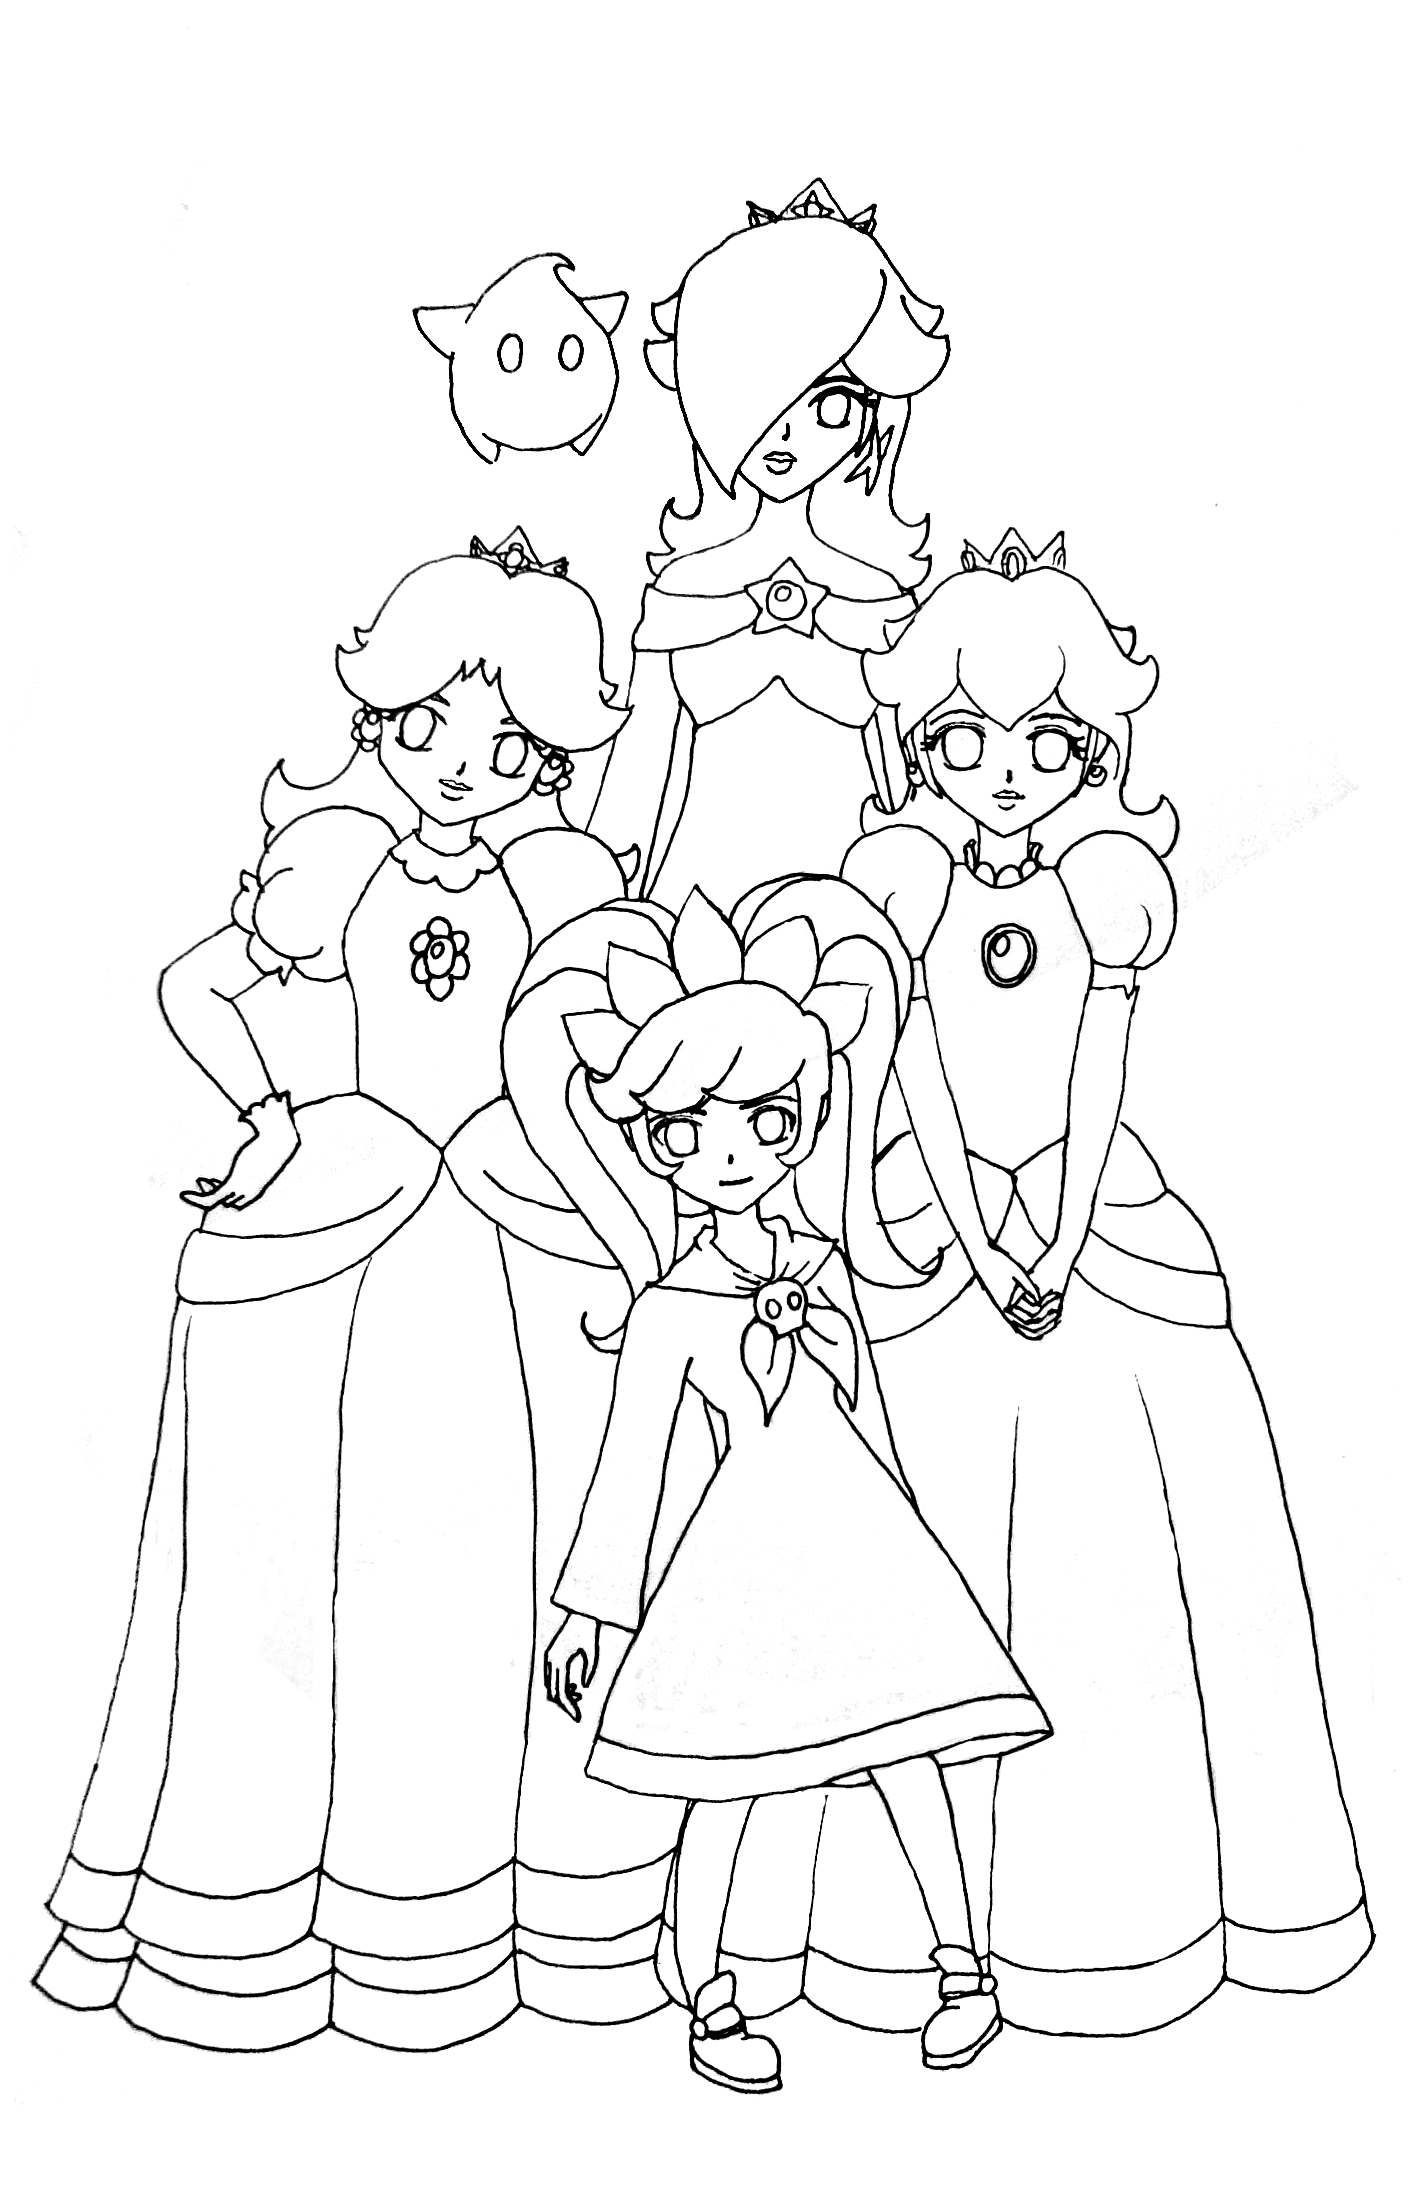 princesses by daphne1988 on deviantart